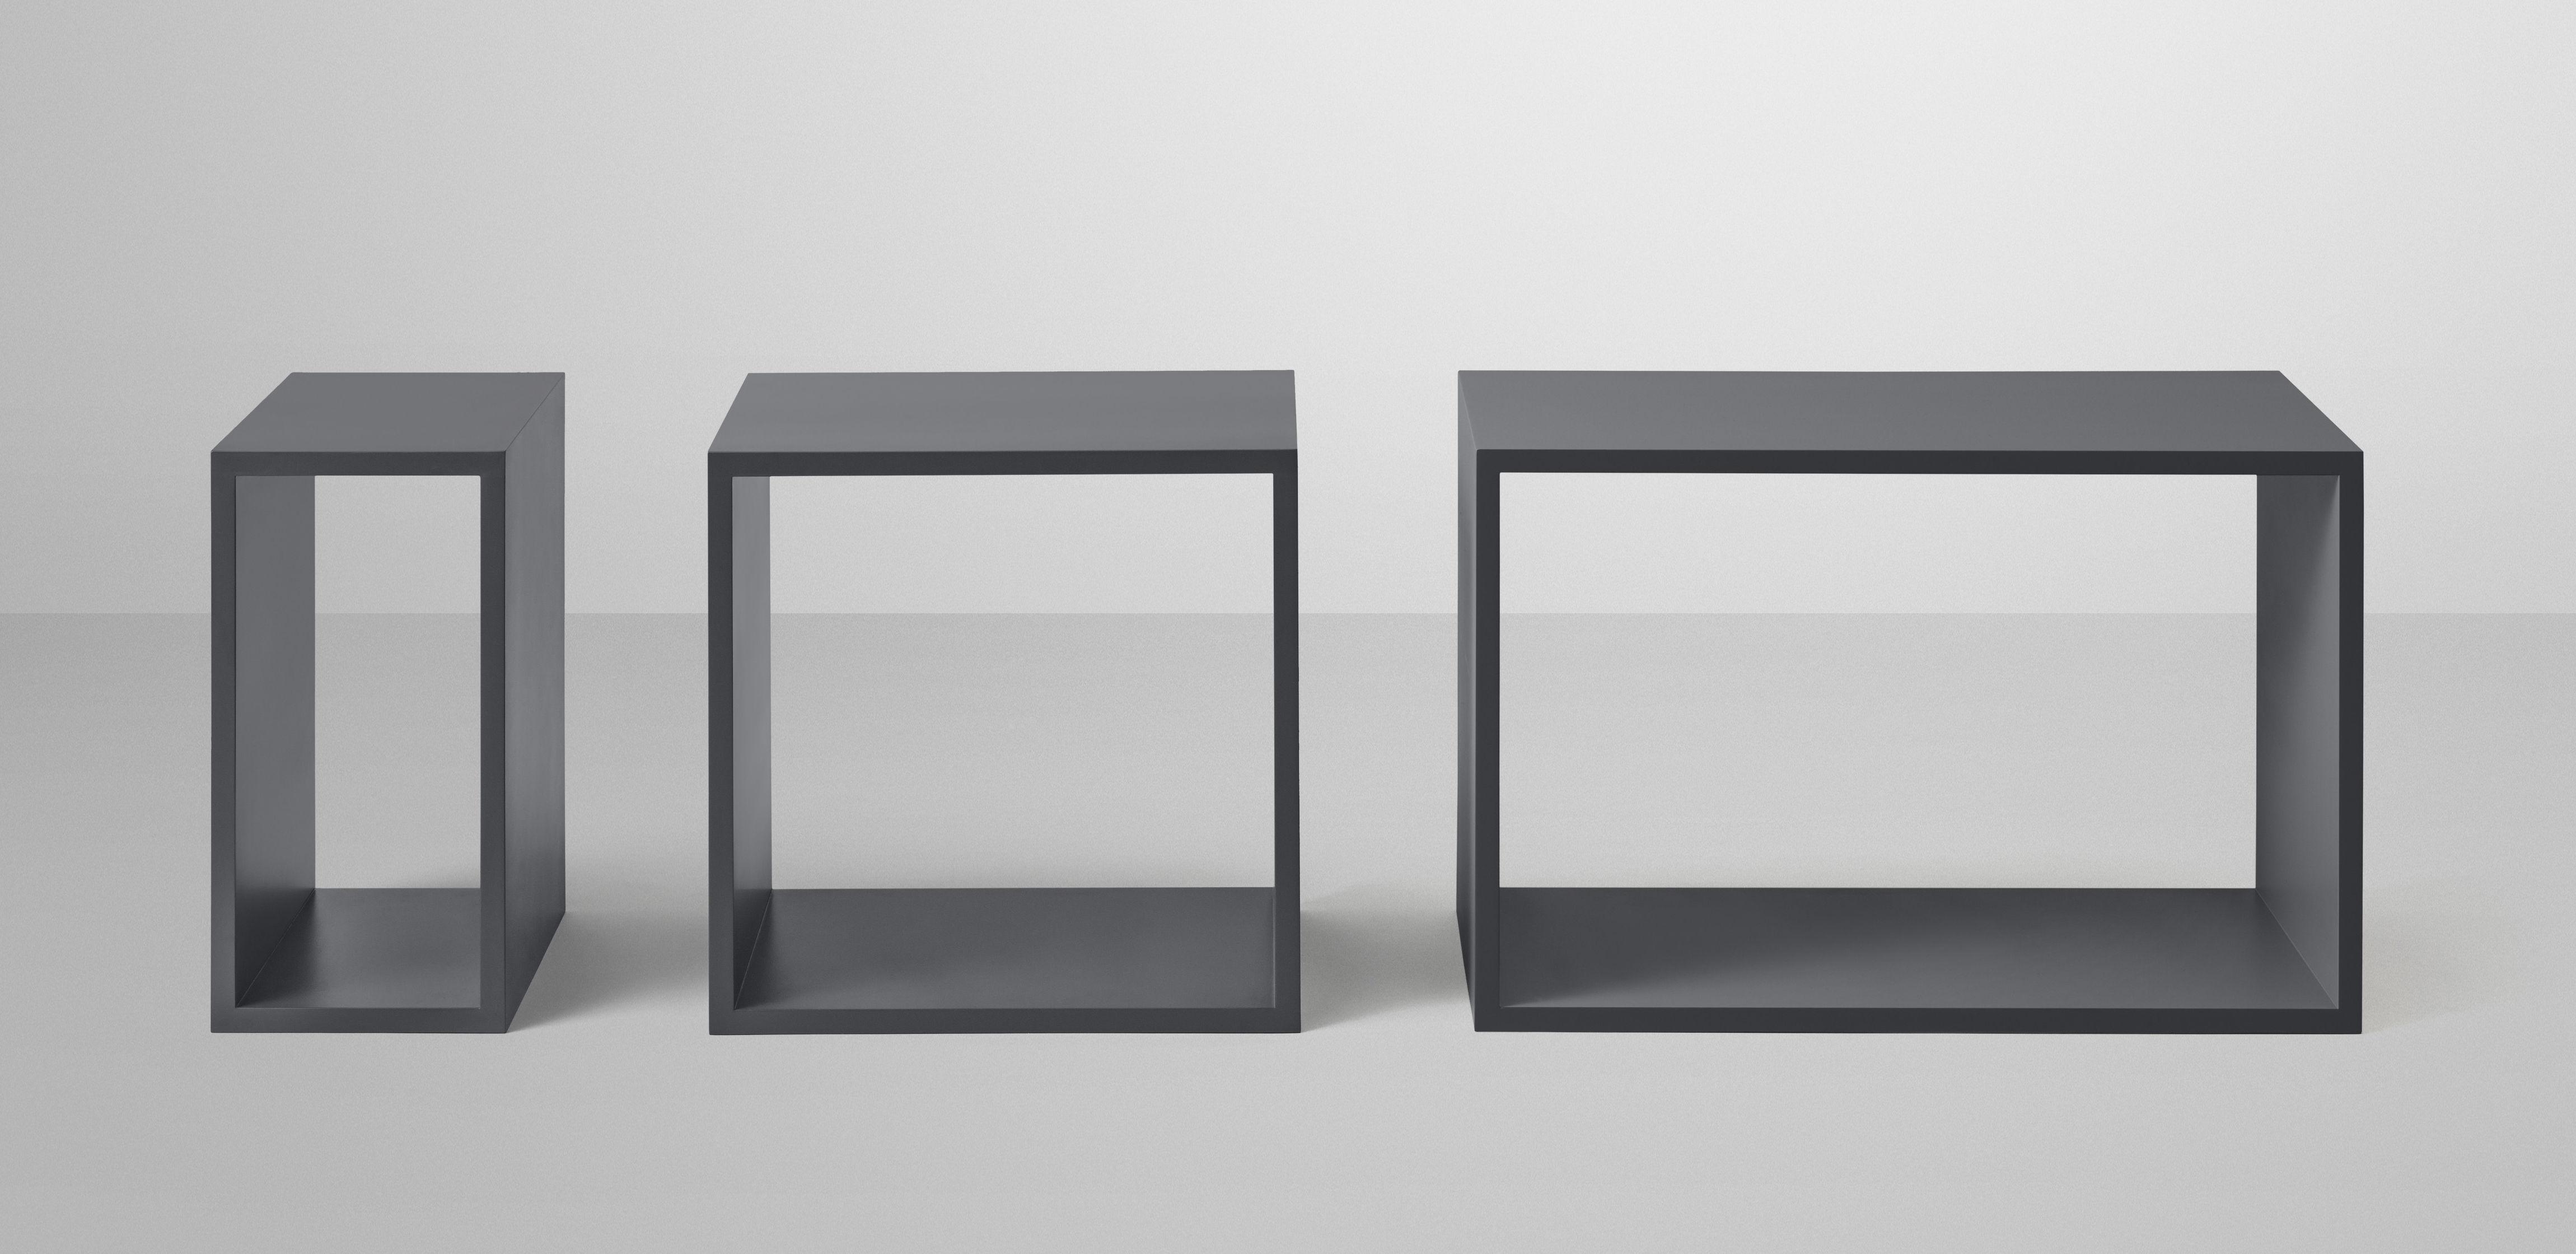 etag re stacked large rectangulaire 65x43 cm sans fond gris fonc muuto. Black Bedroom Furniture Sets. Home Design Ideas